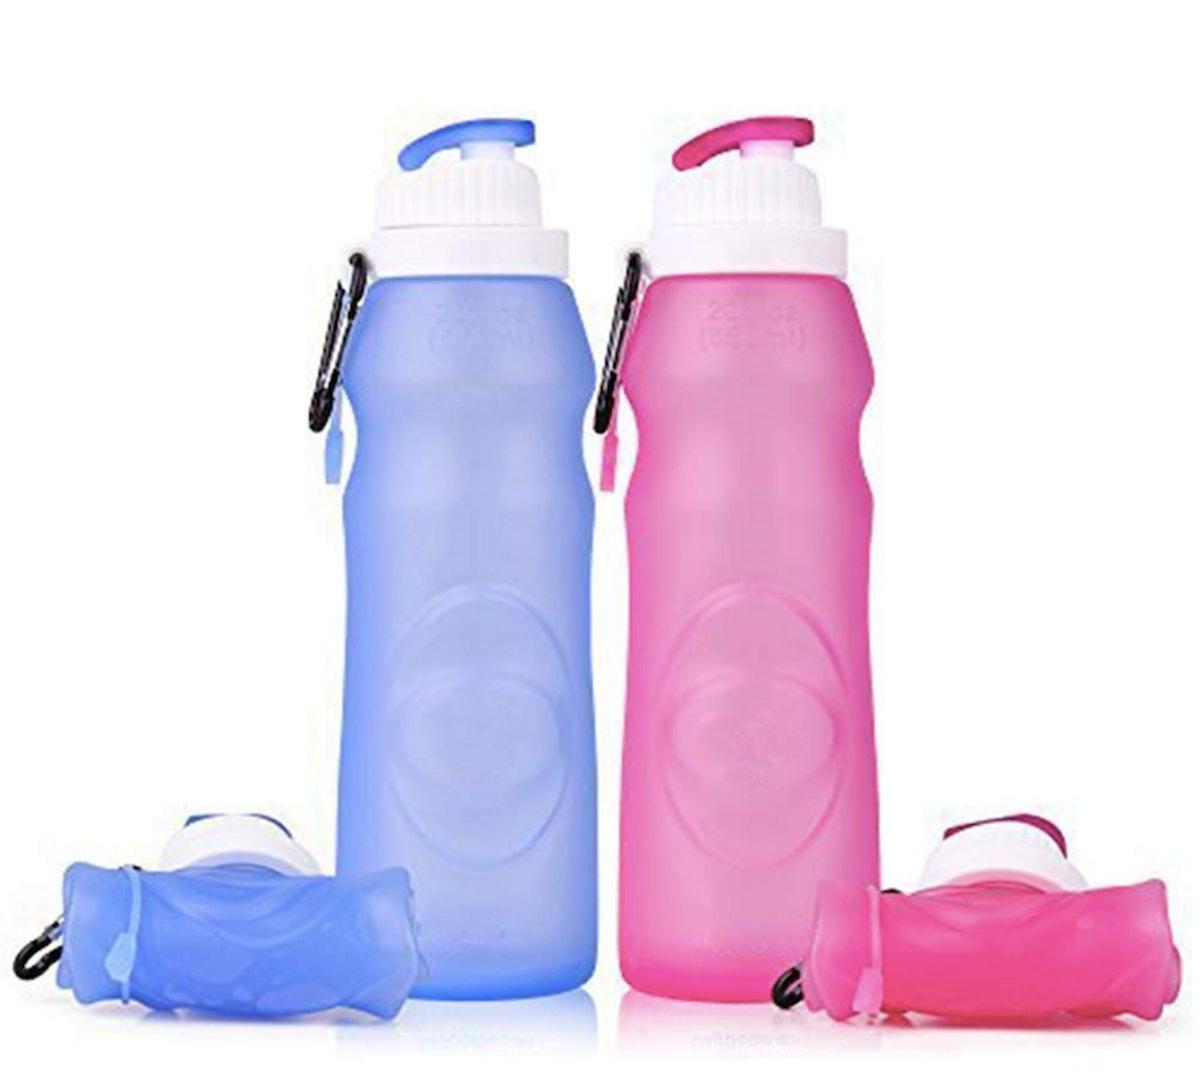 Baiji Bottle Collapsible Silicone Water Bottles (Set of 2)